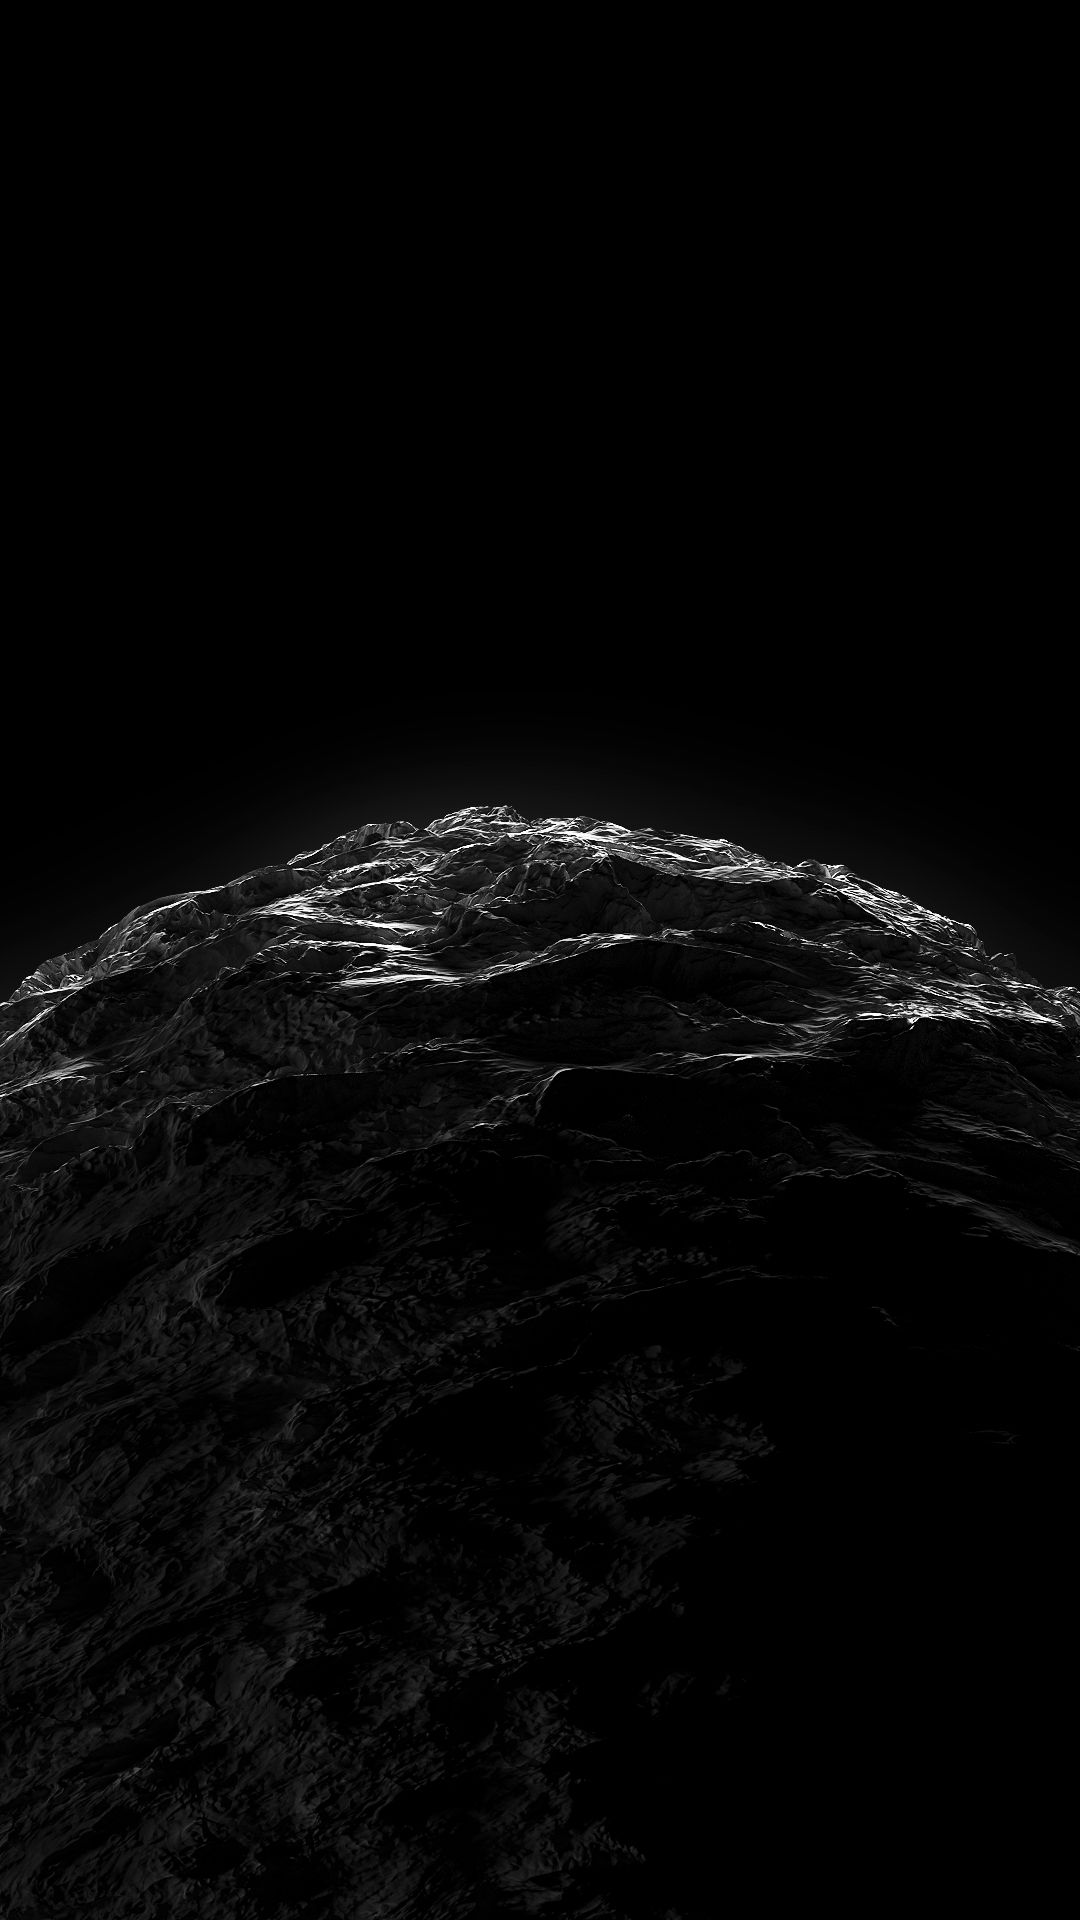 Black Ix By Jean Marc Denis Black Phone Wallpaper Dark Wallpaper Iphone Dark Wallpaper